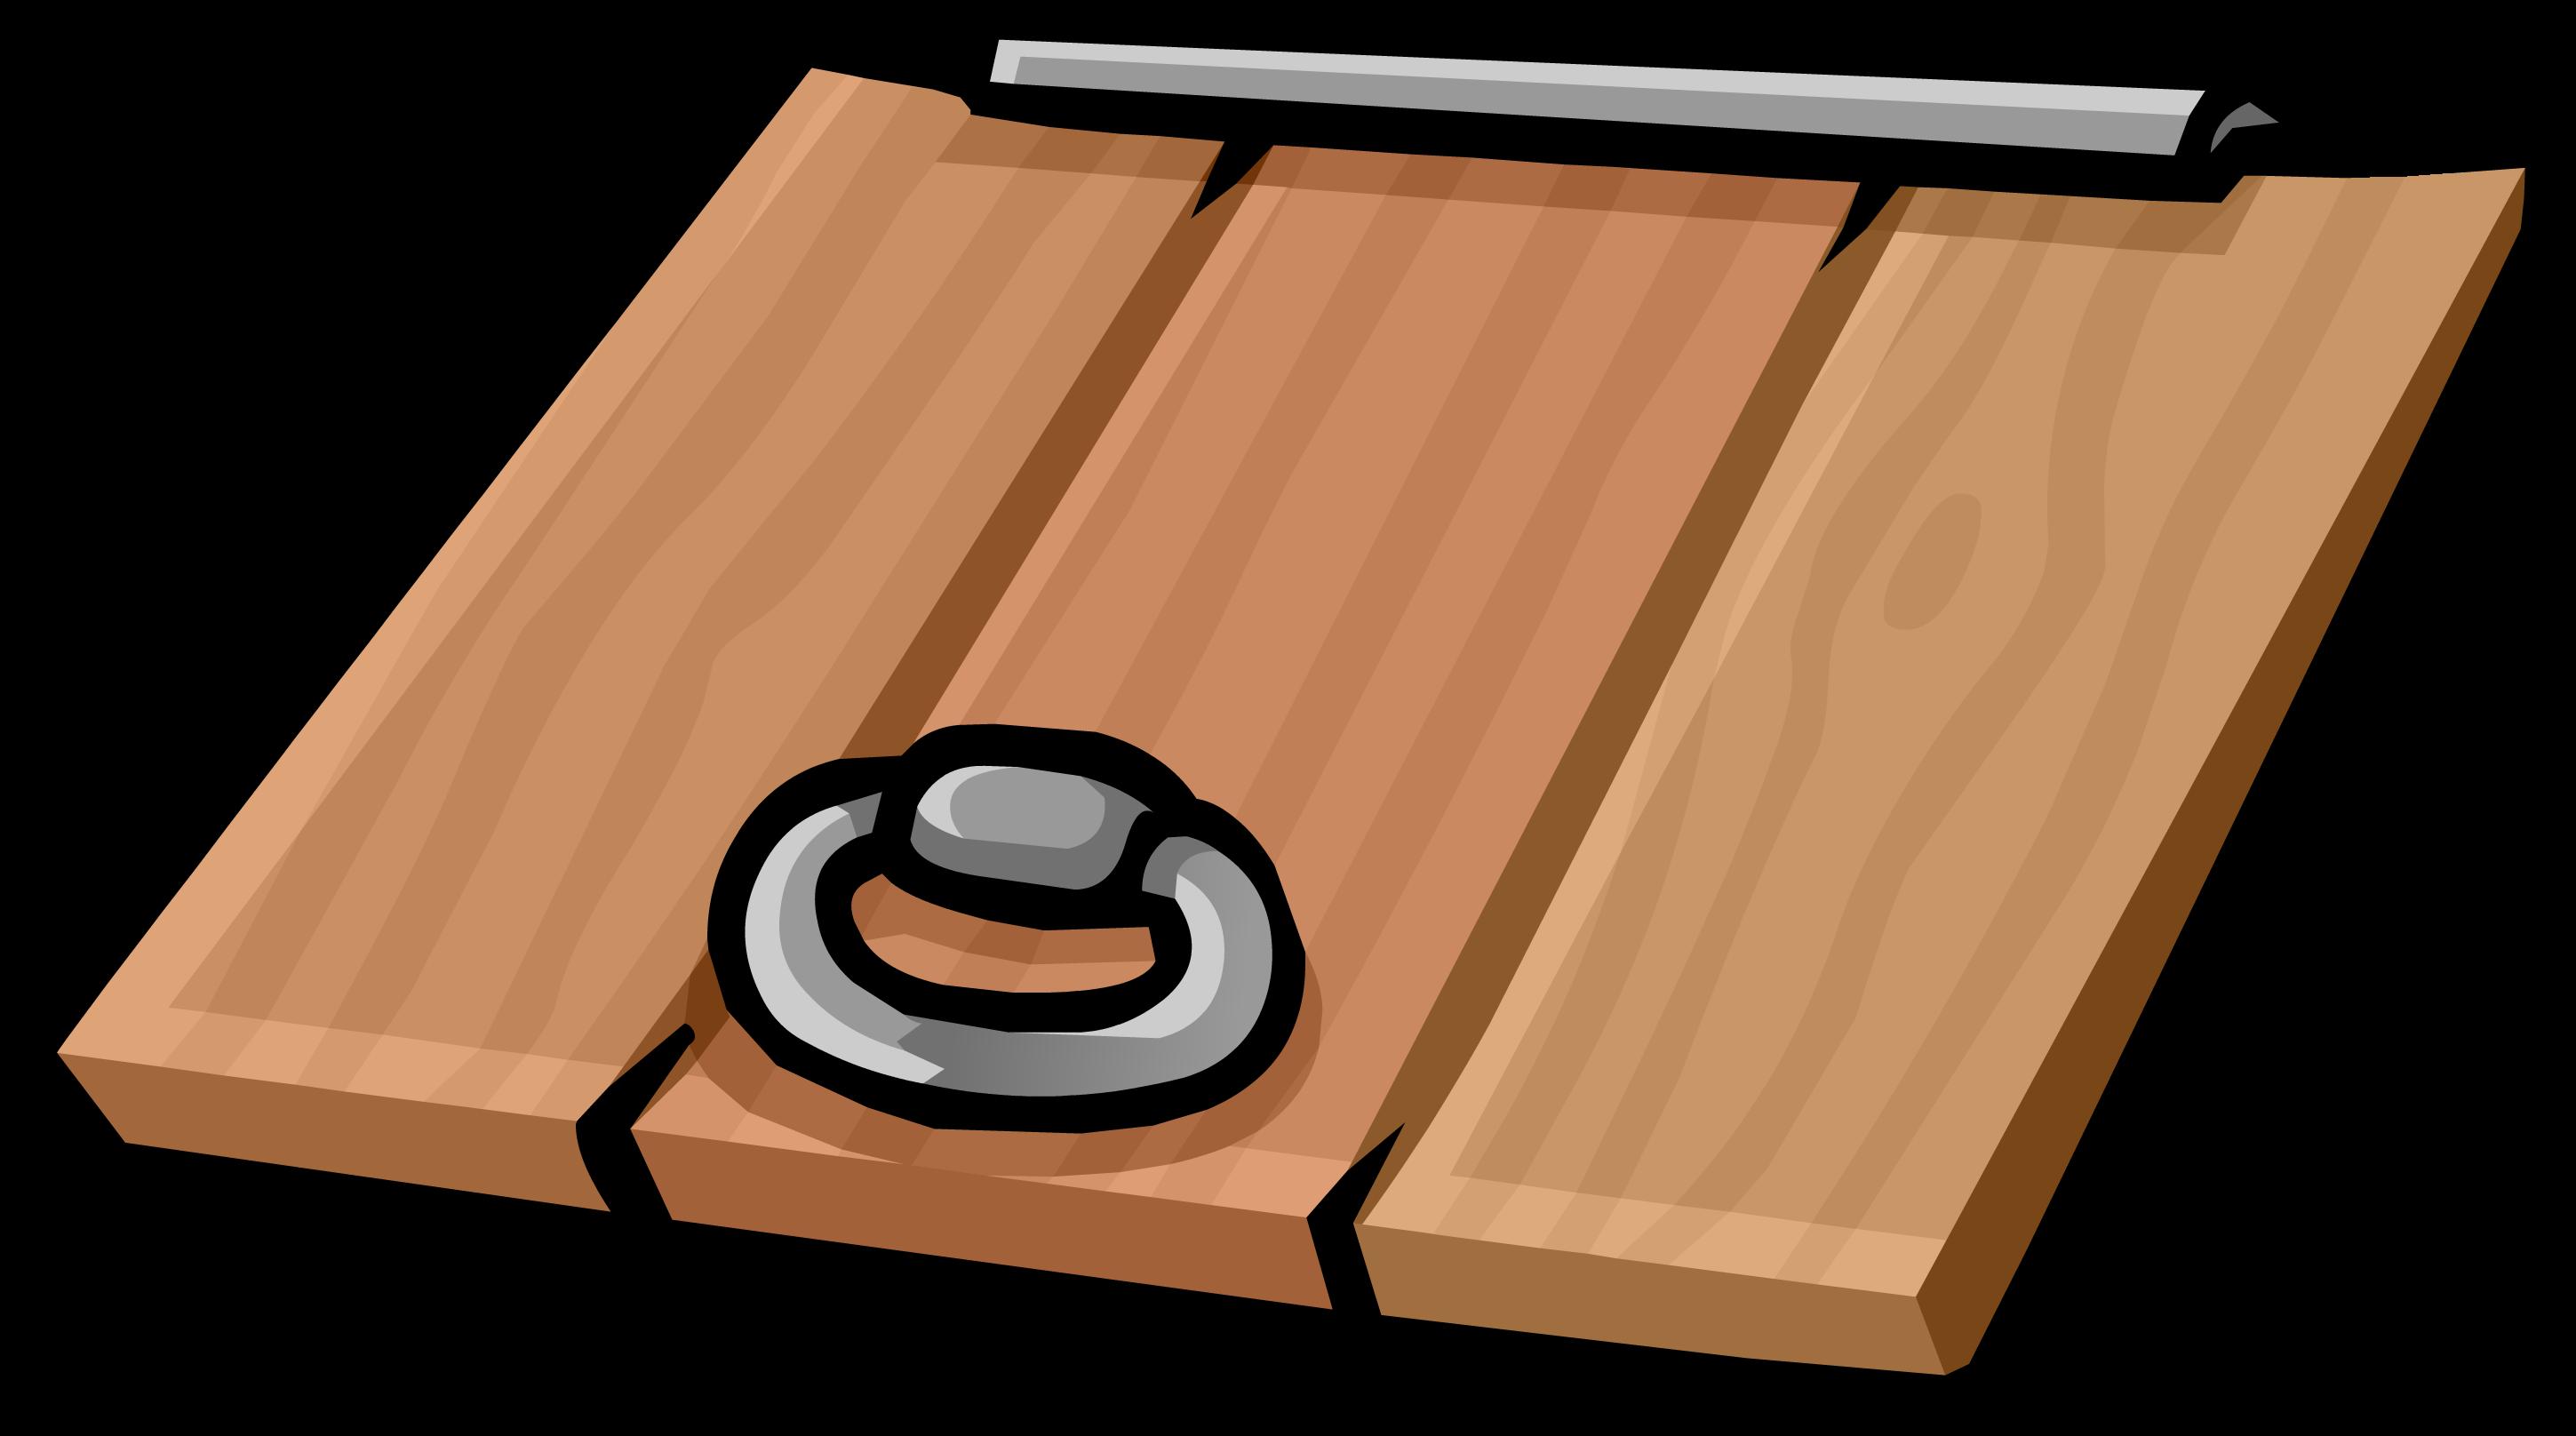 Trap Door Club Penguin Wiki The Free Editable